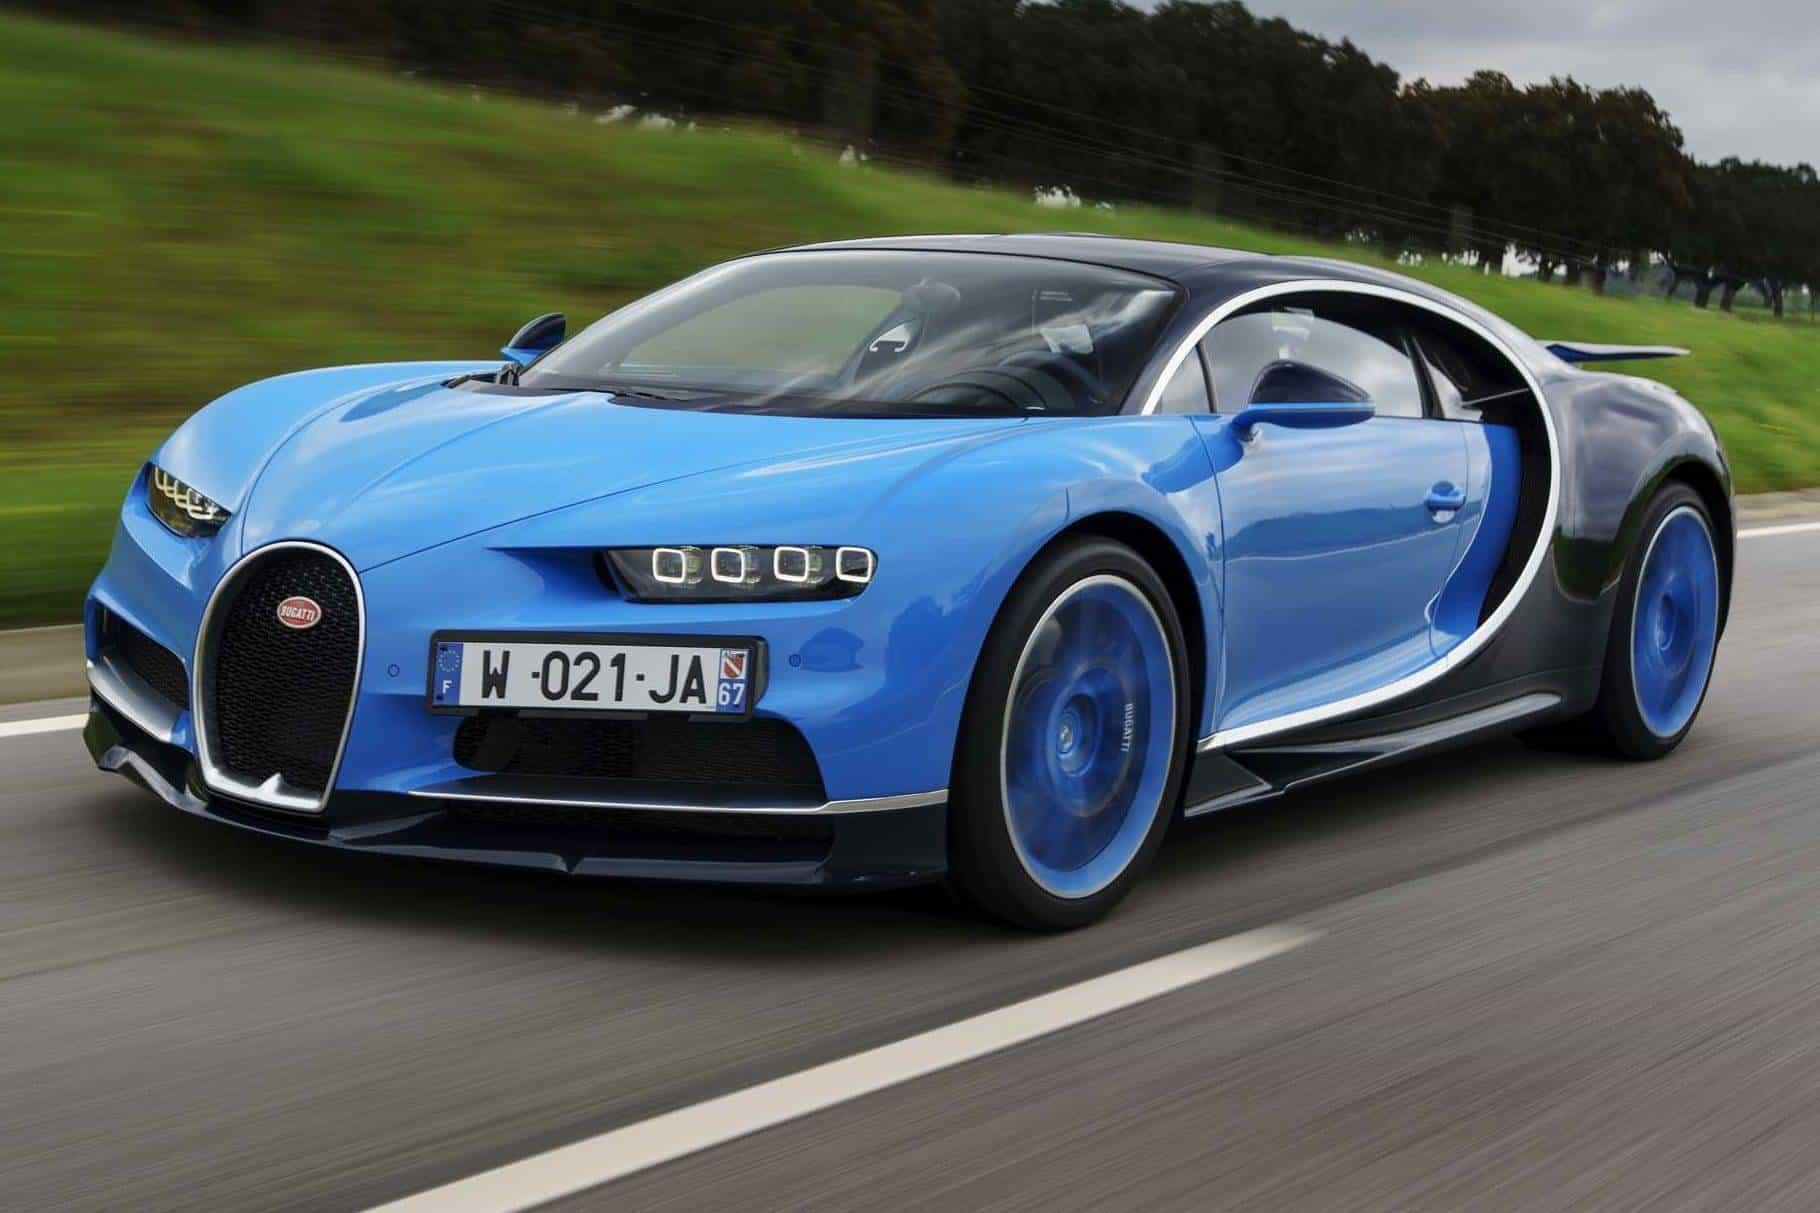 Bugatti's journey to the top